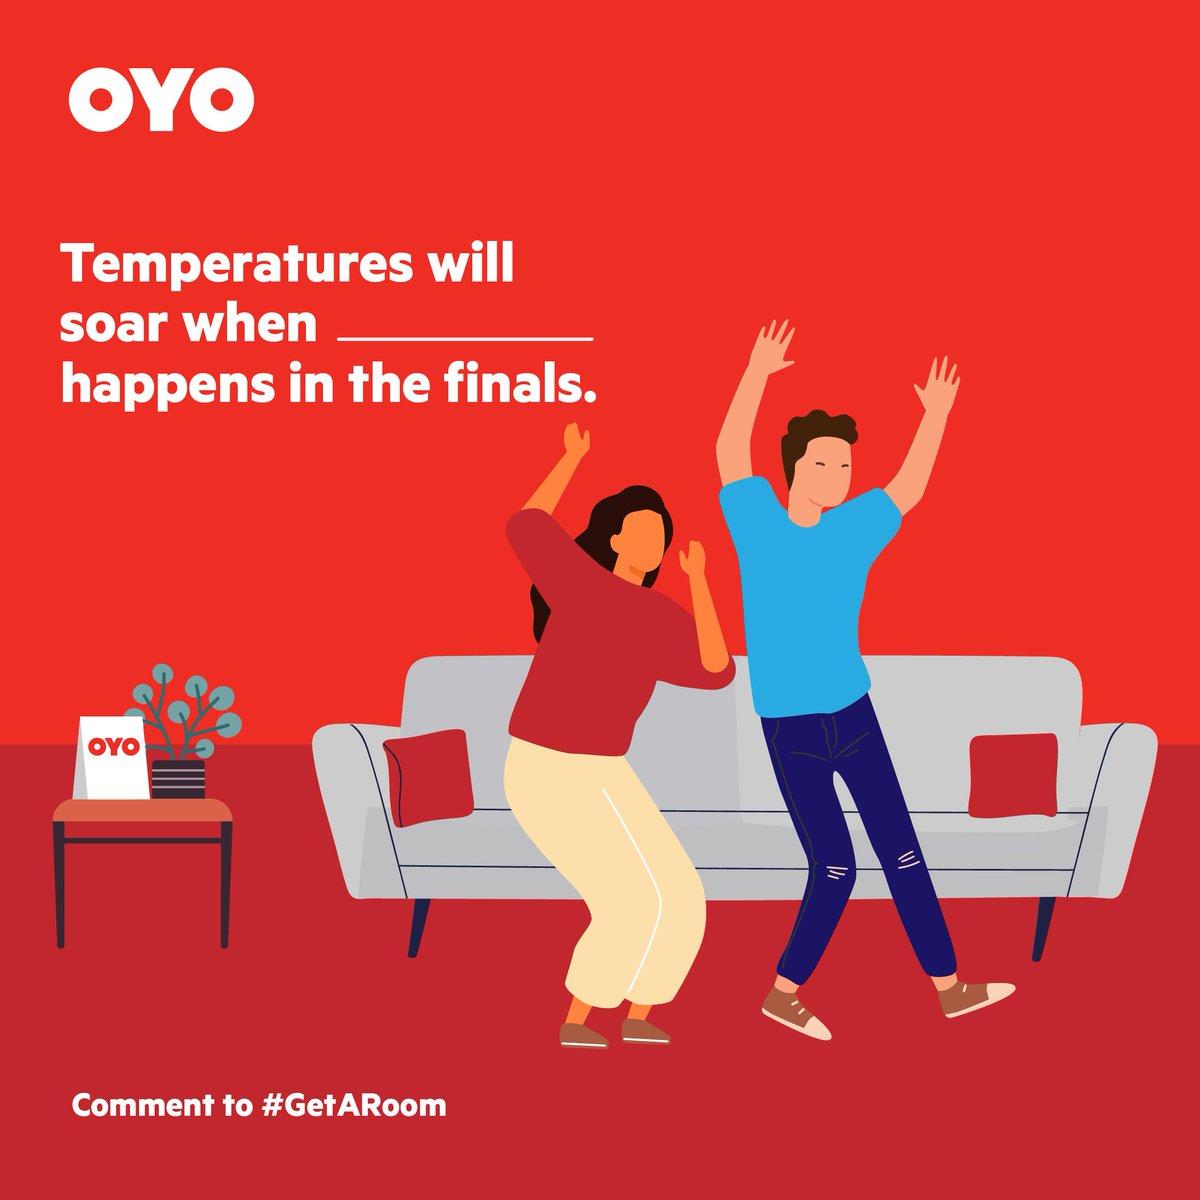 OYO on Twitter: